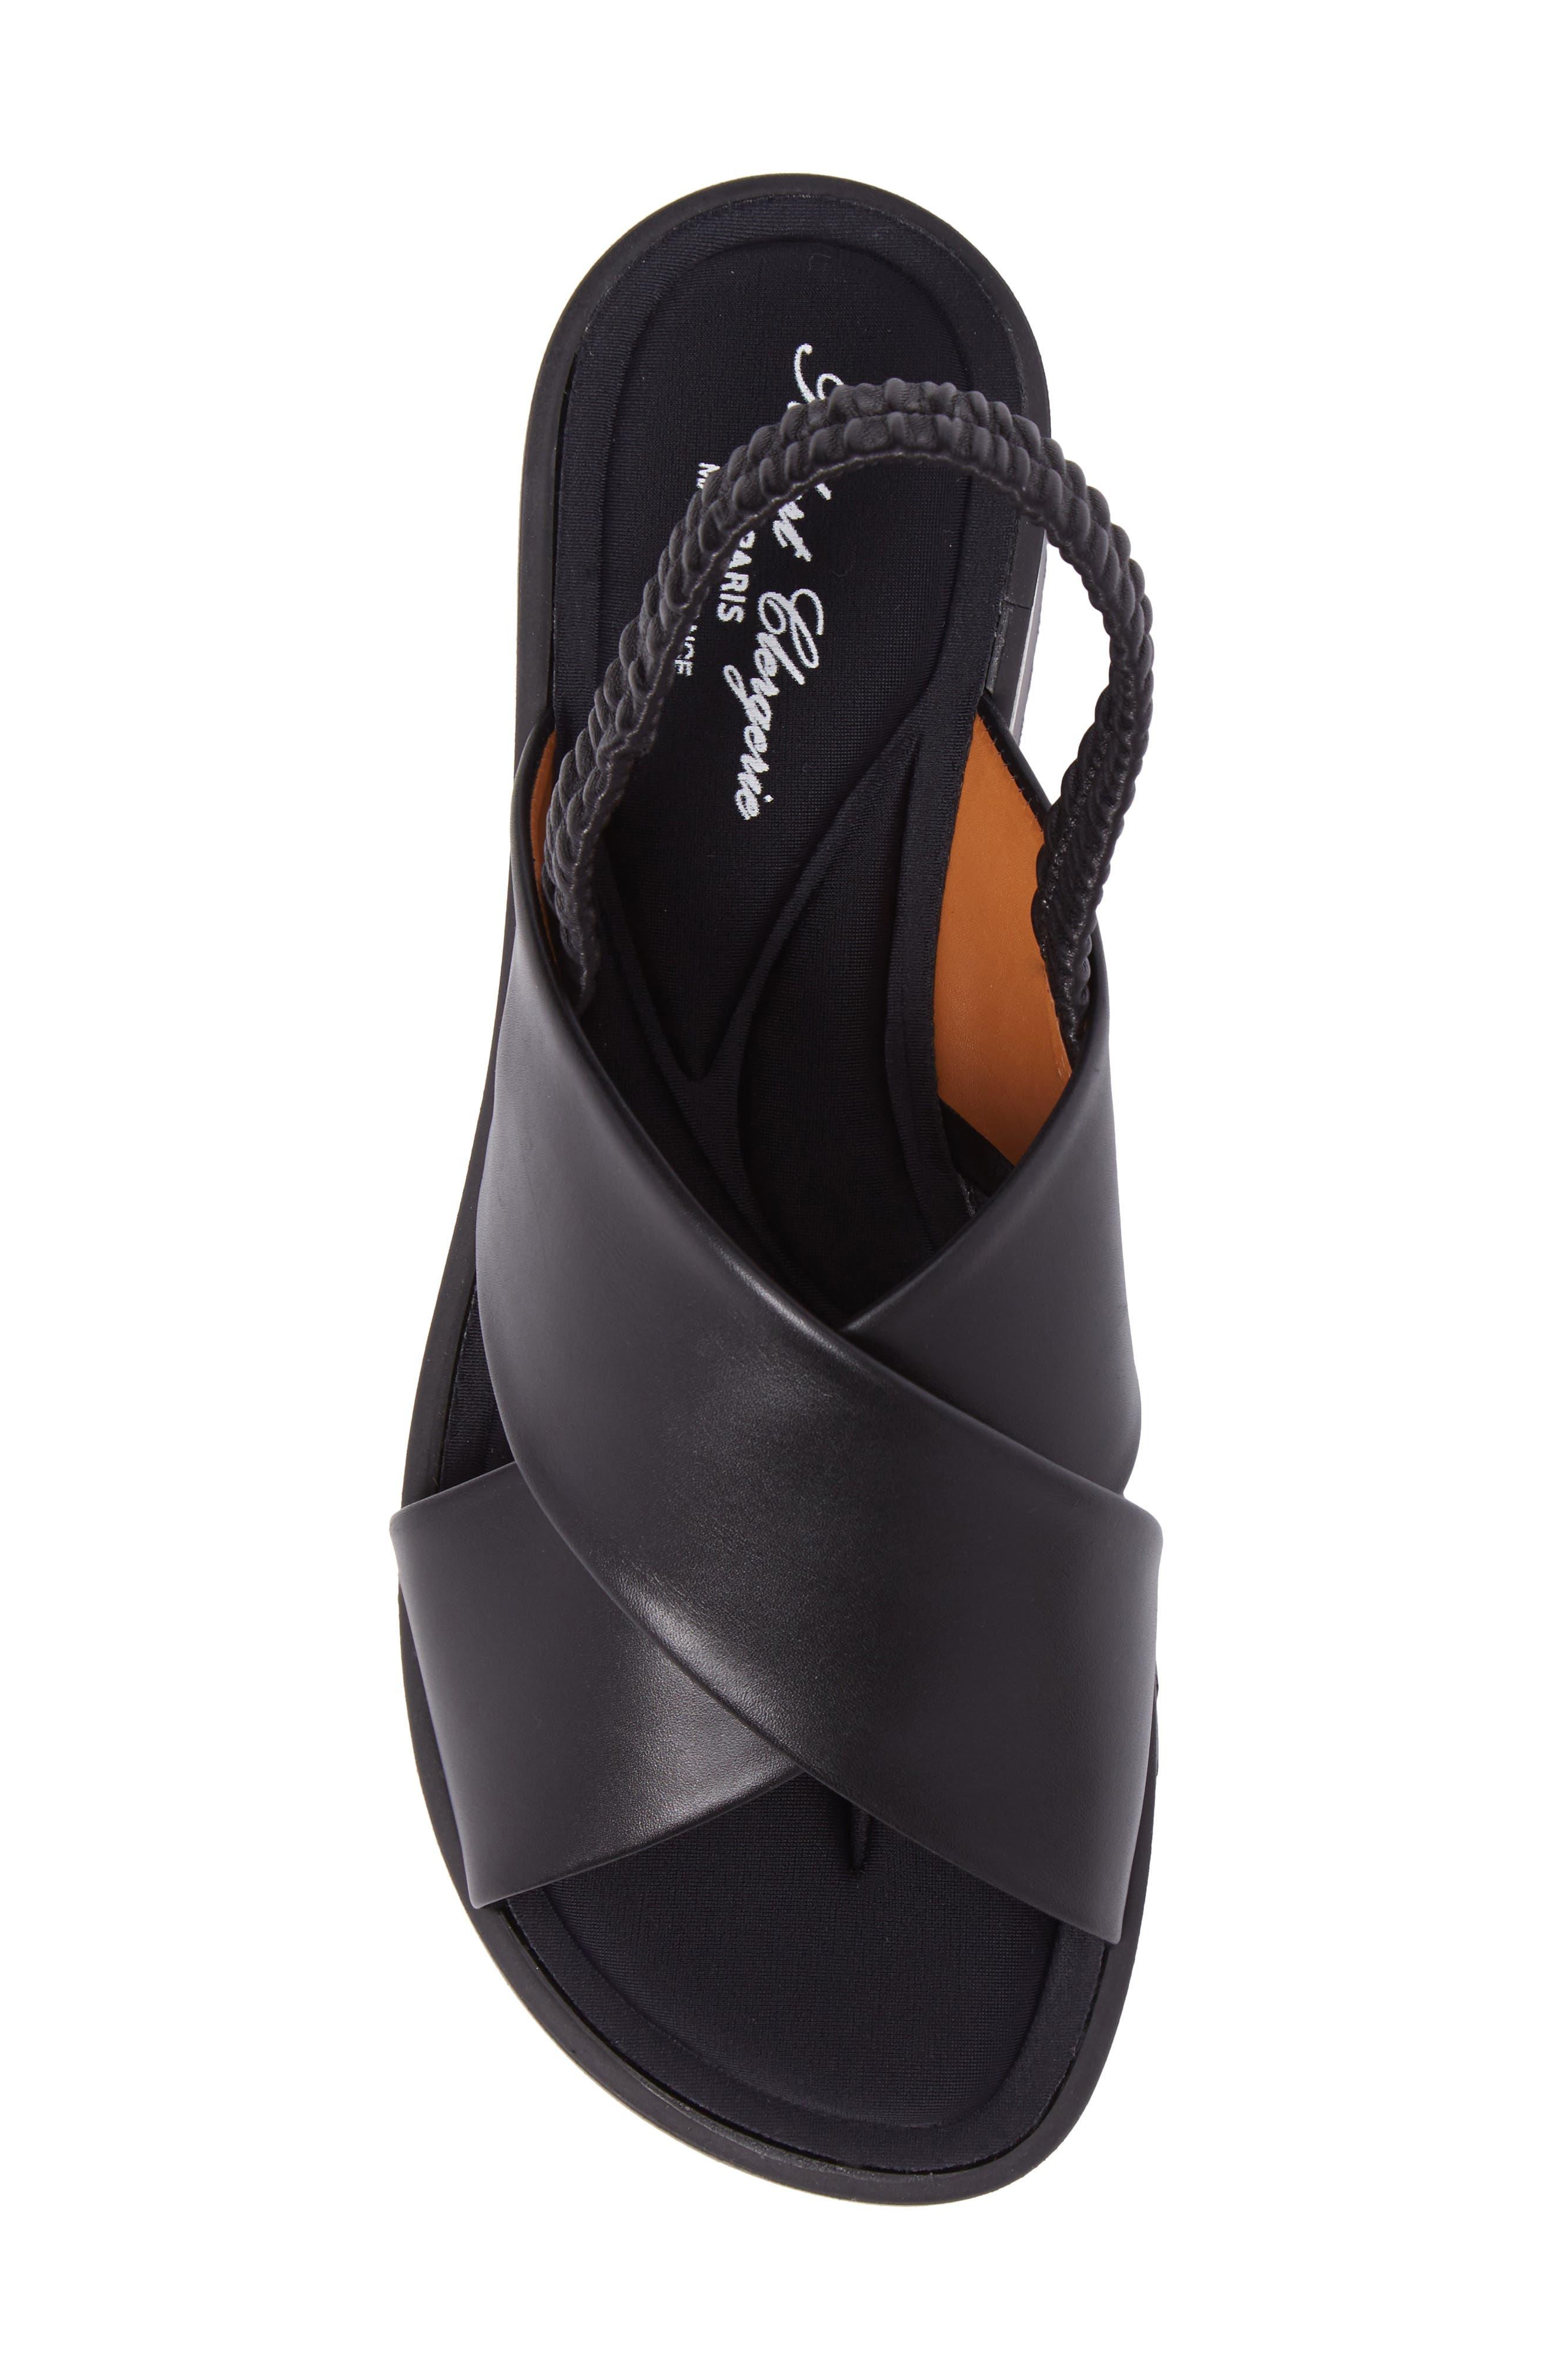 Omin Platform Slingback Sandal,                             Alternate thumbnail 5, color,                             Black